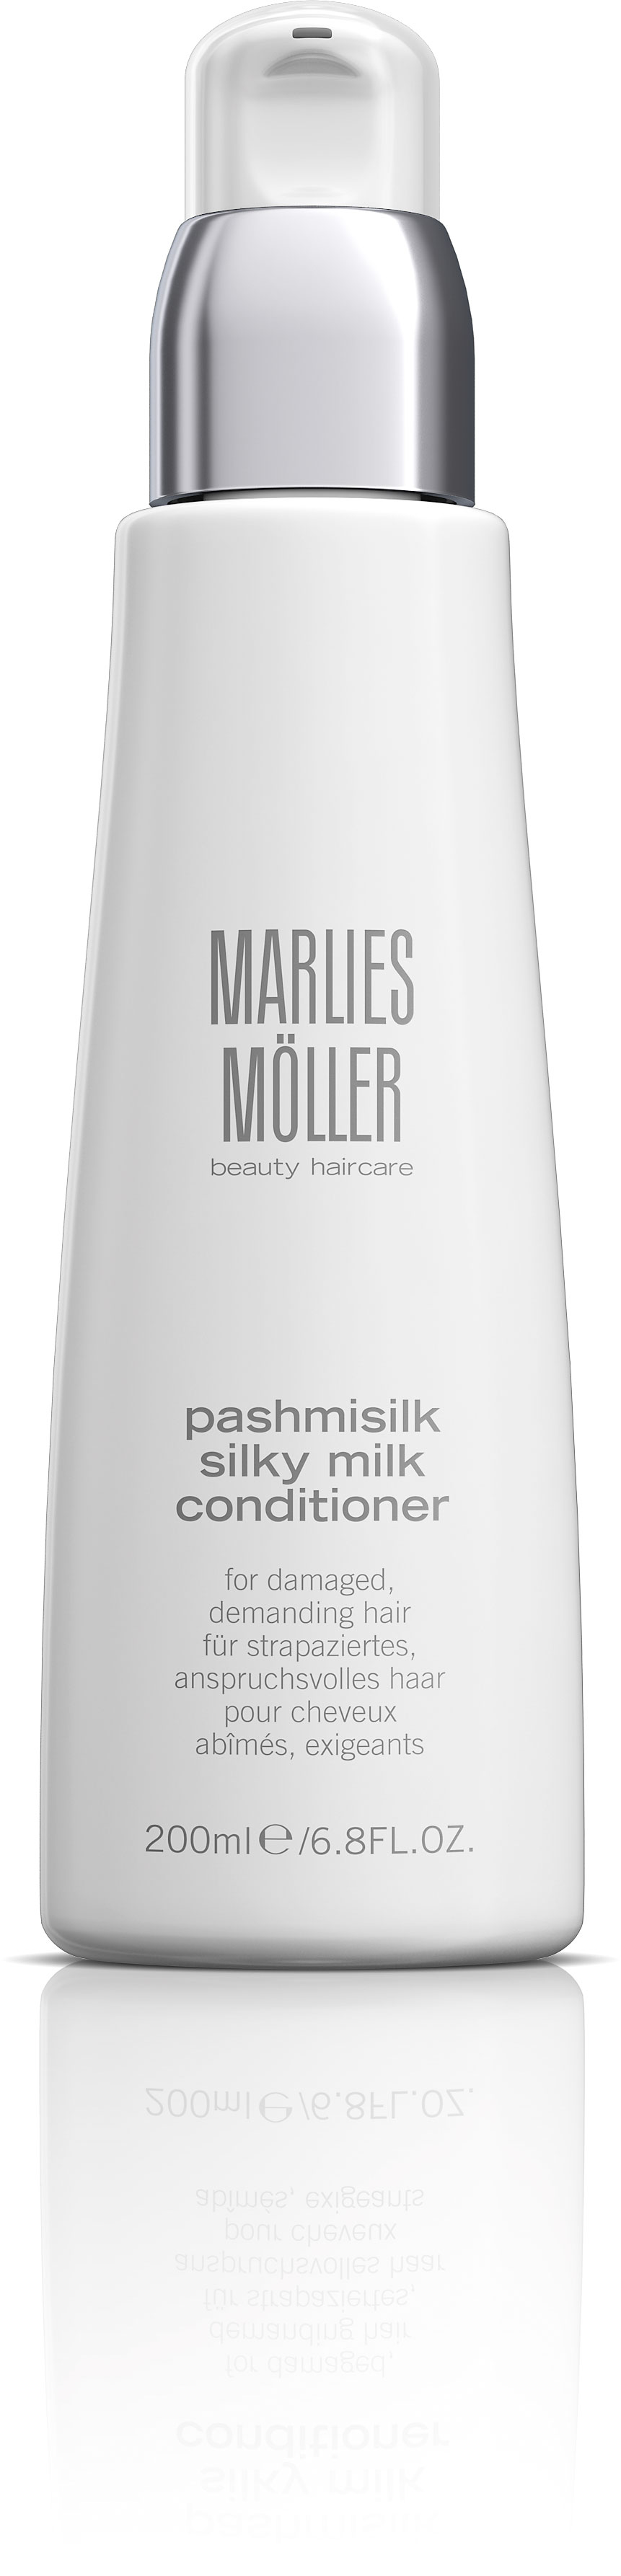 Marlies Möller Pash Silk Condition Milk 200 ml